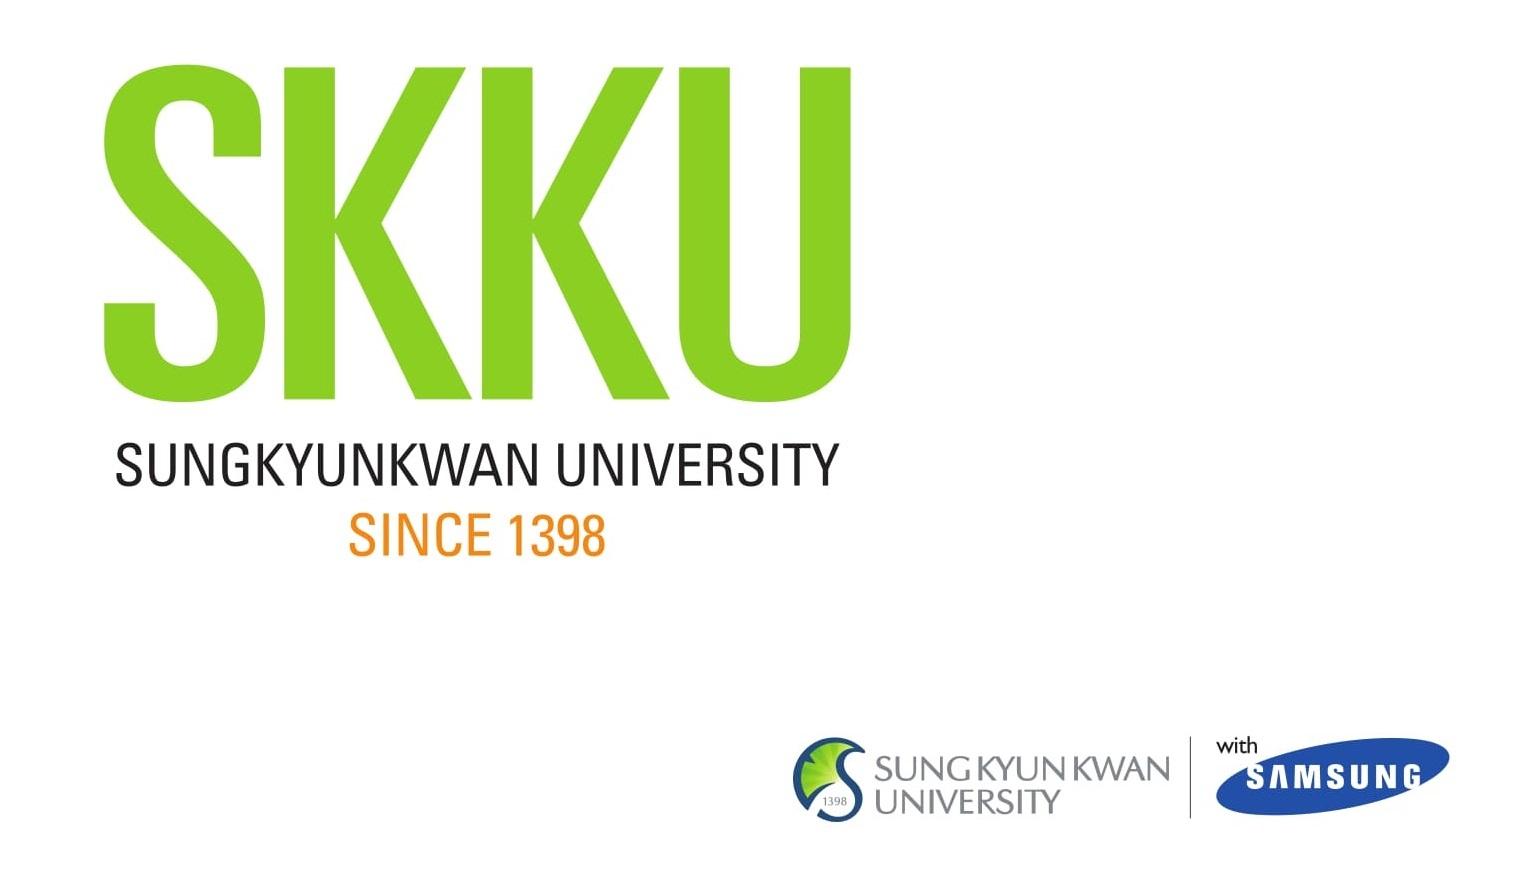 2017 SKKU Leaflet-1 - Copy